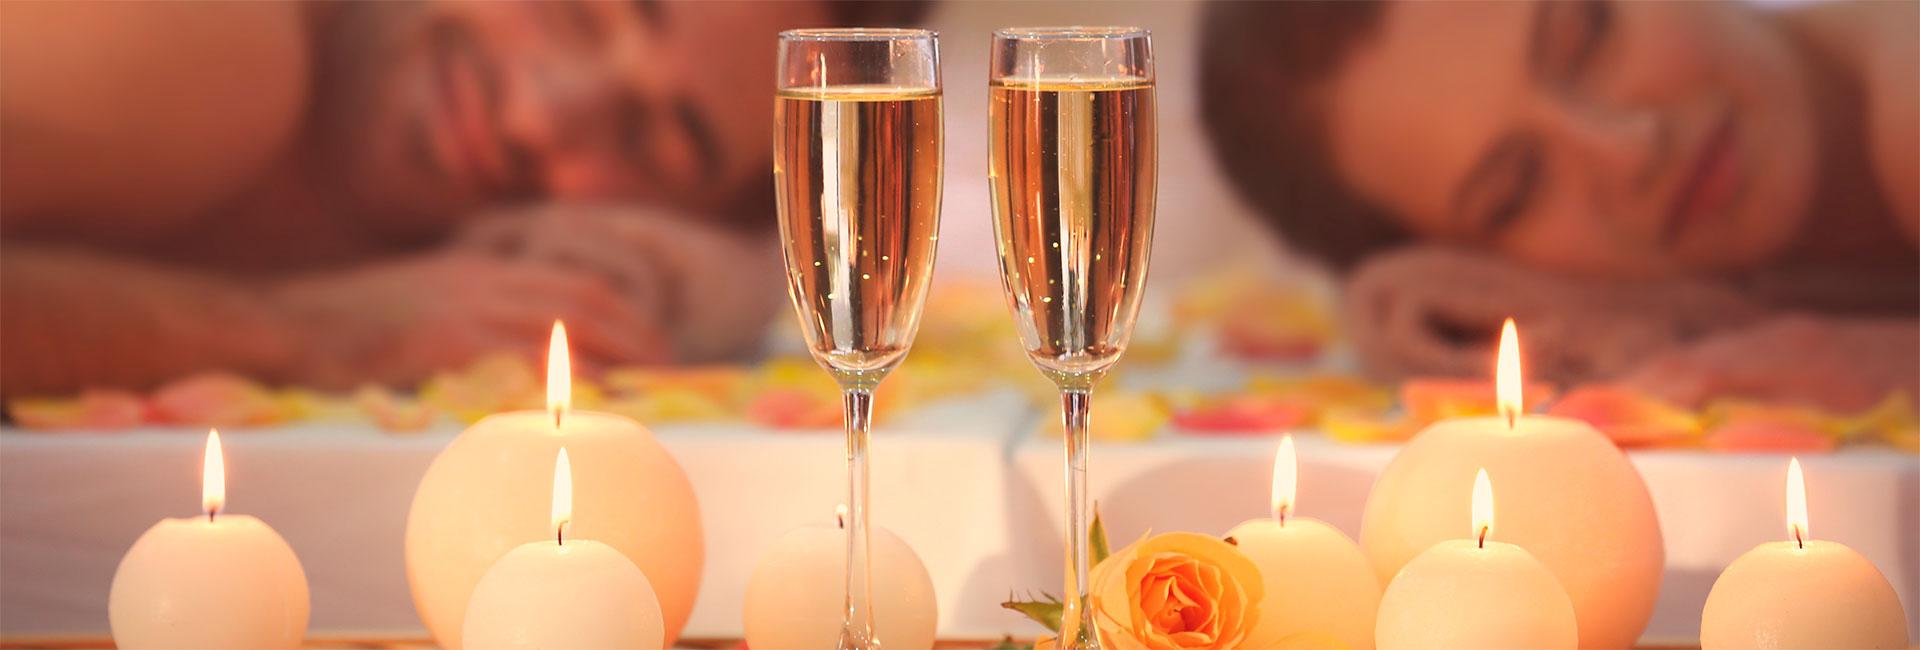 Optimizada romantic spa experiences  for couples